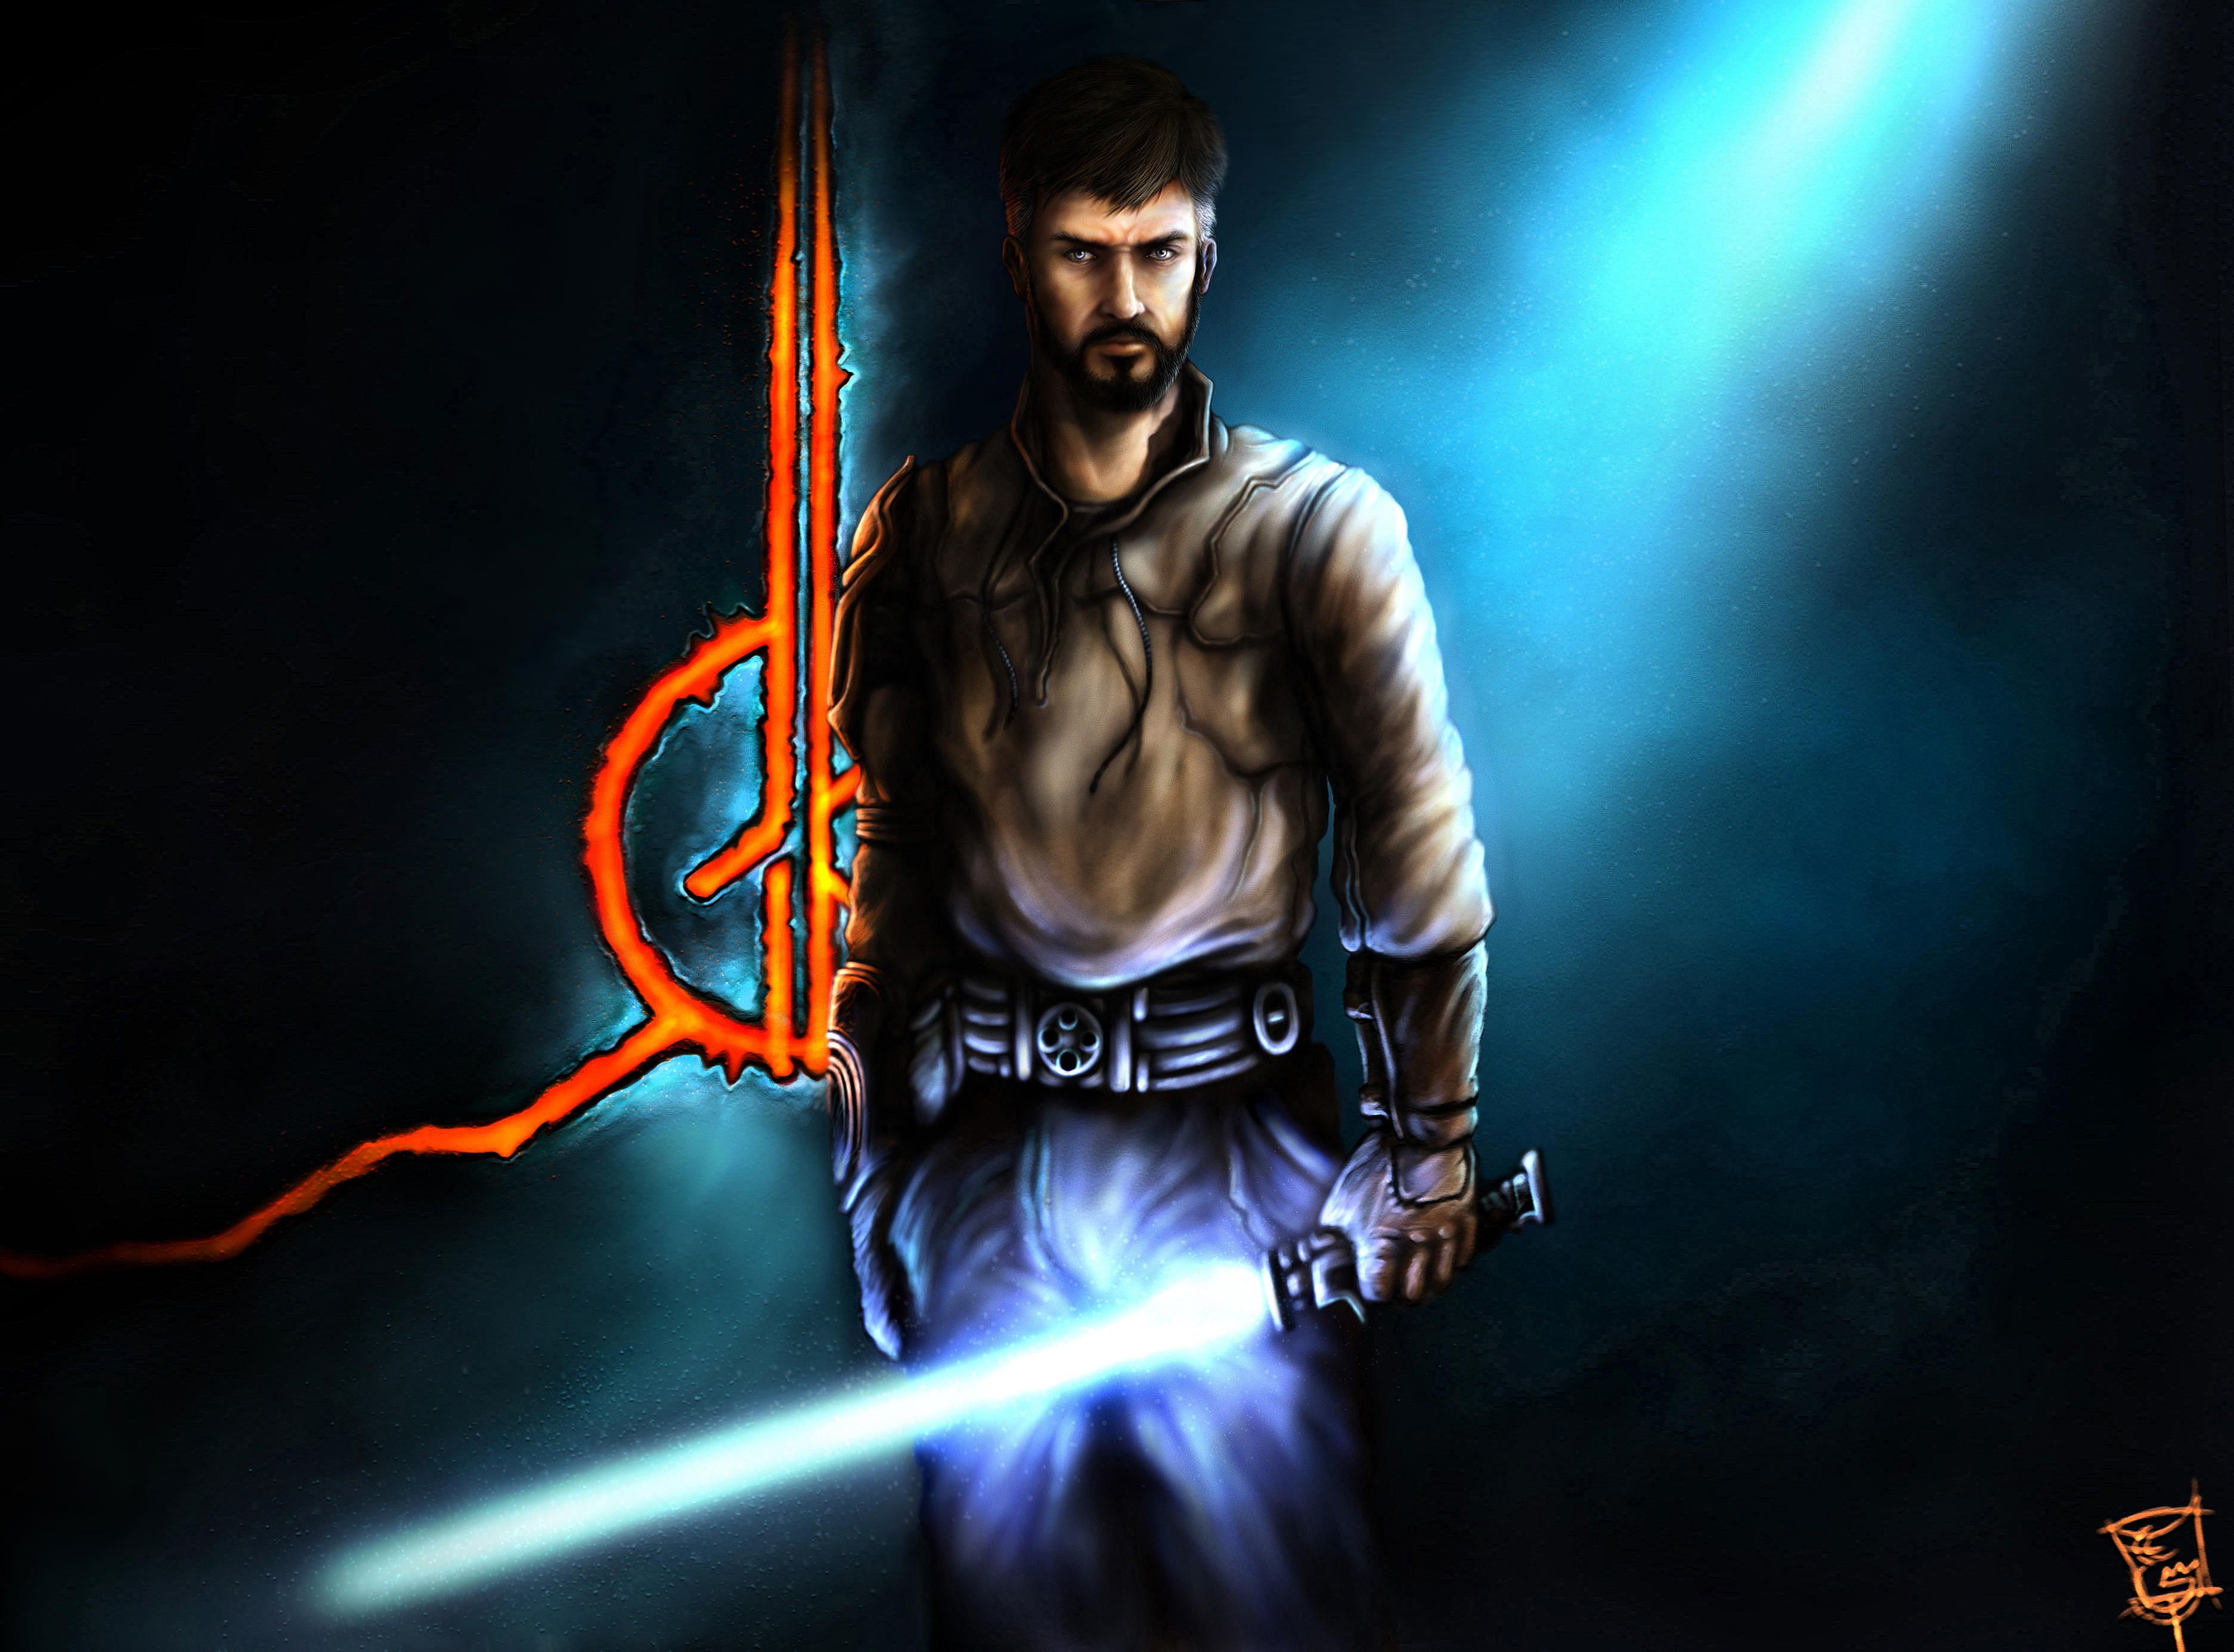 Jedi Knight Kyle Katarn By Thegameworld On Deviantart